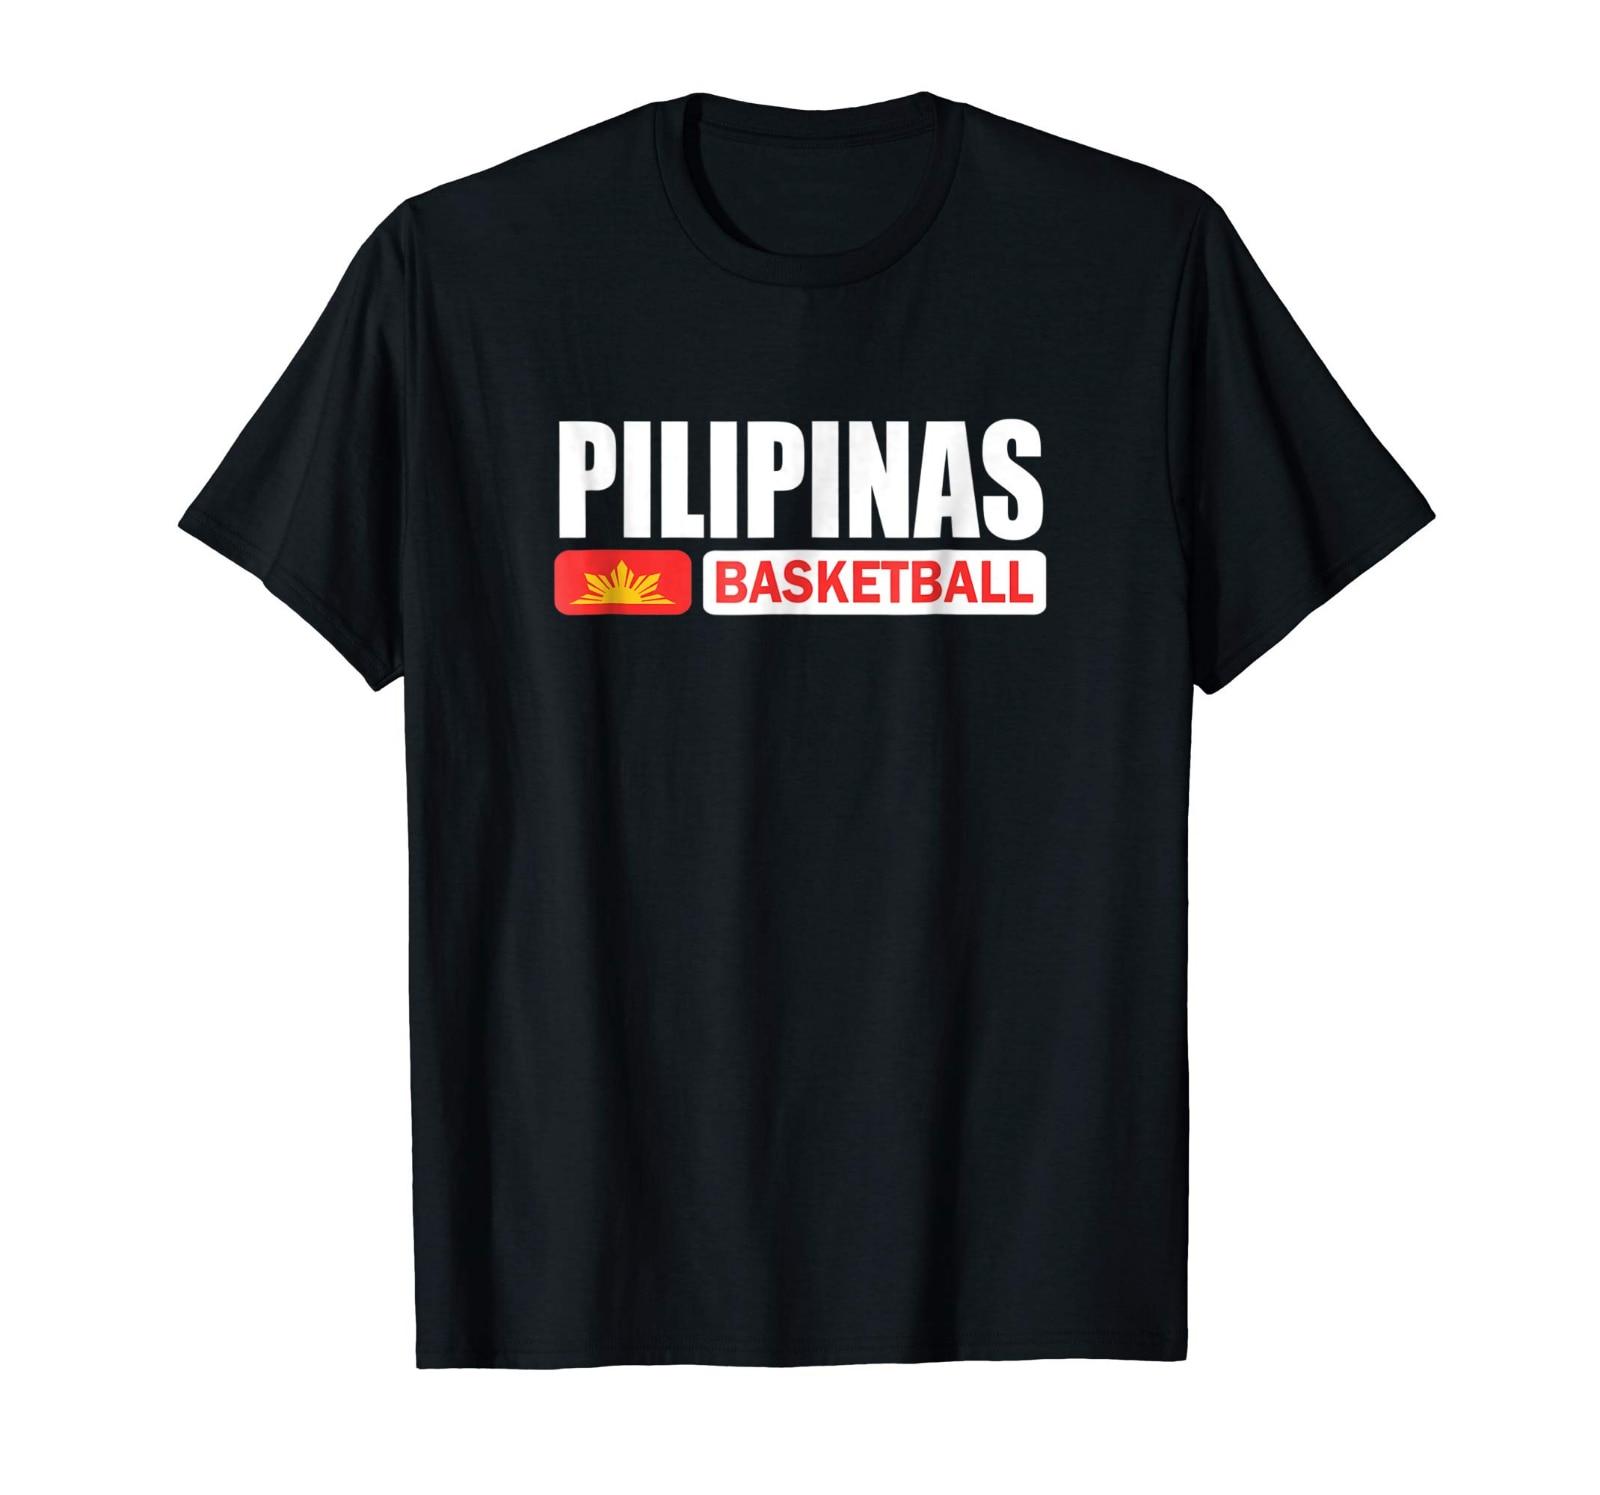 500168b36fc2a Pilipinas Basketball Black T-Shirt Gilas Philippines FIBA World  Championship Cool Casual pride t shirt